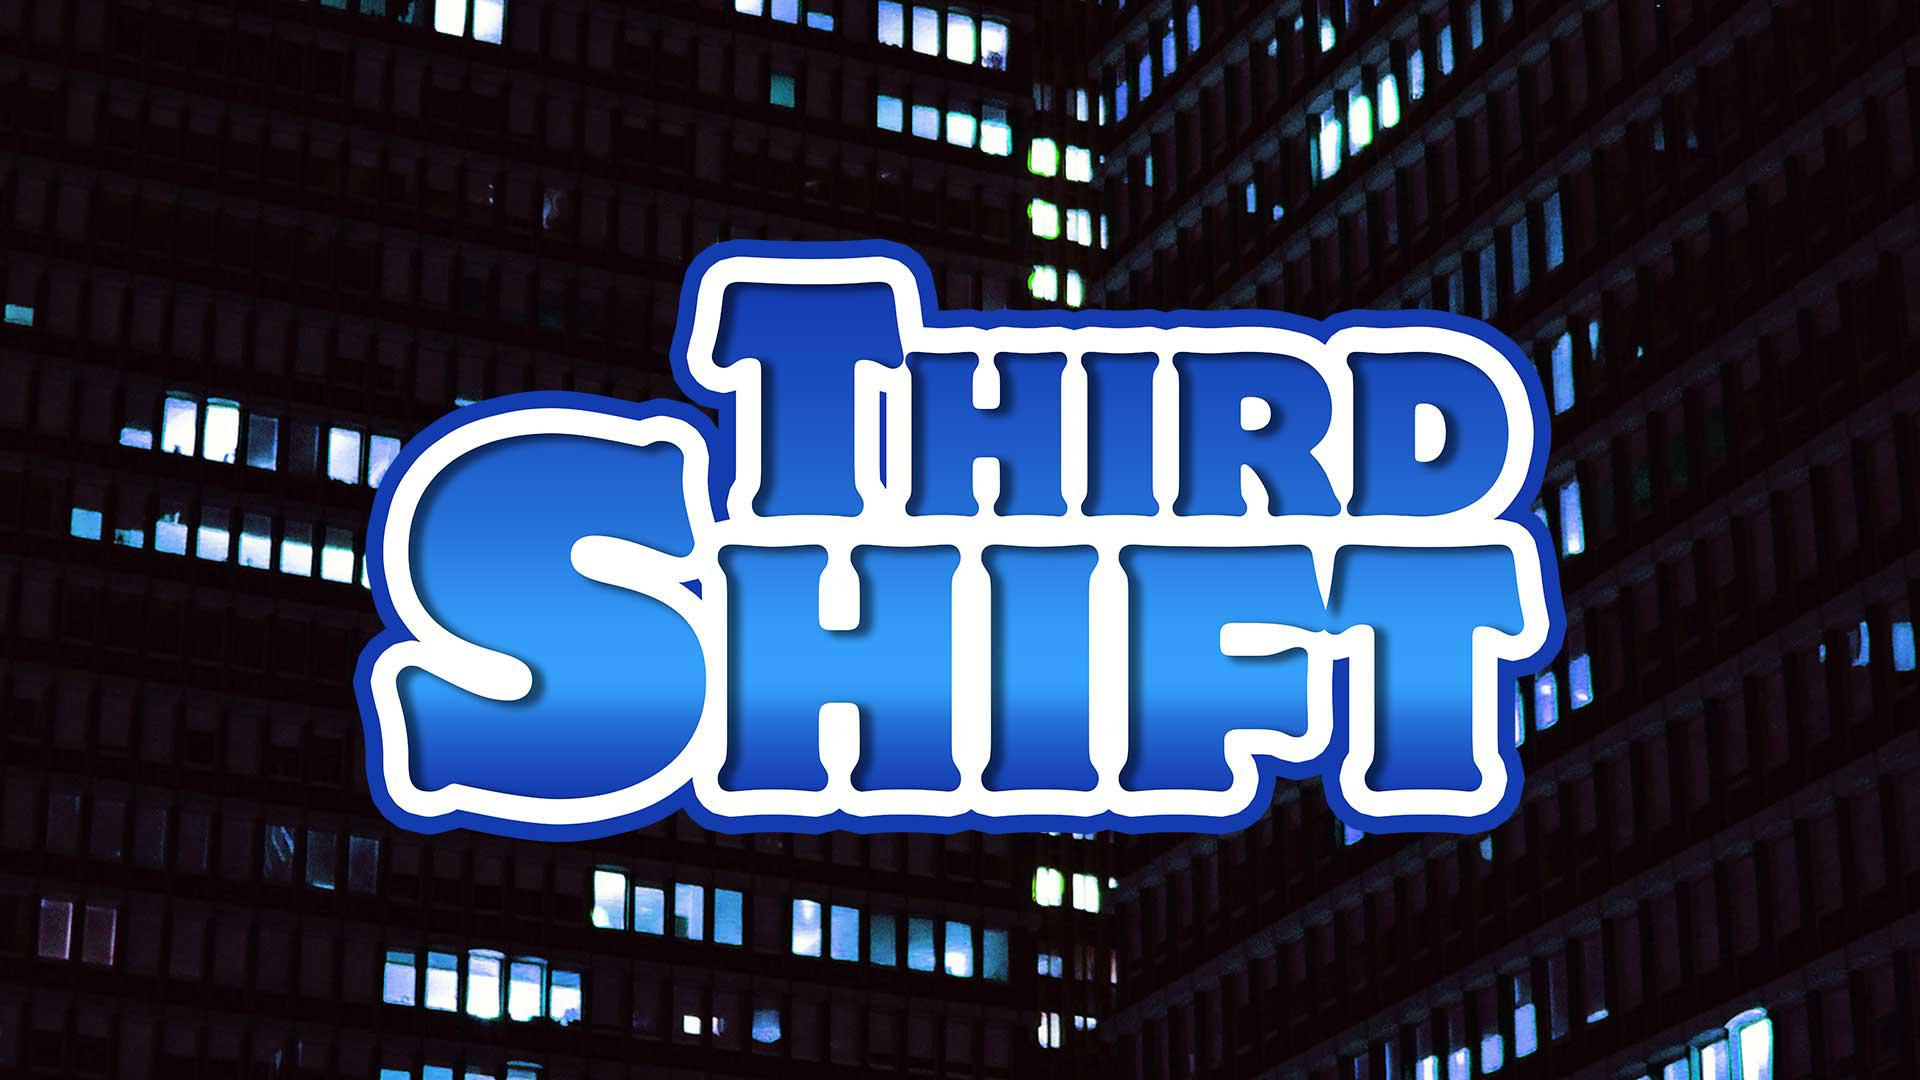 Third Shift